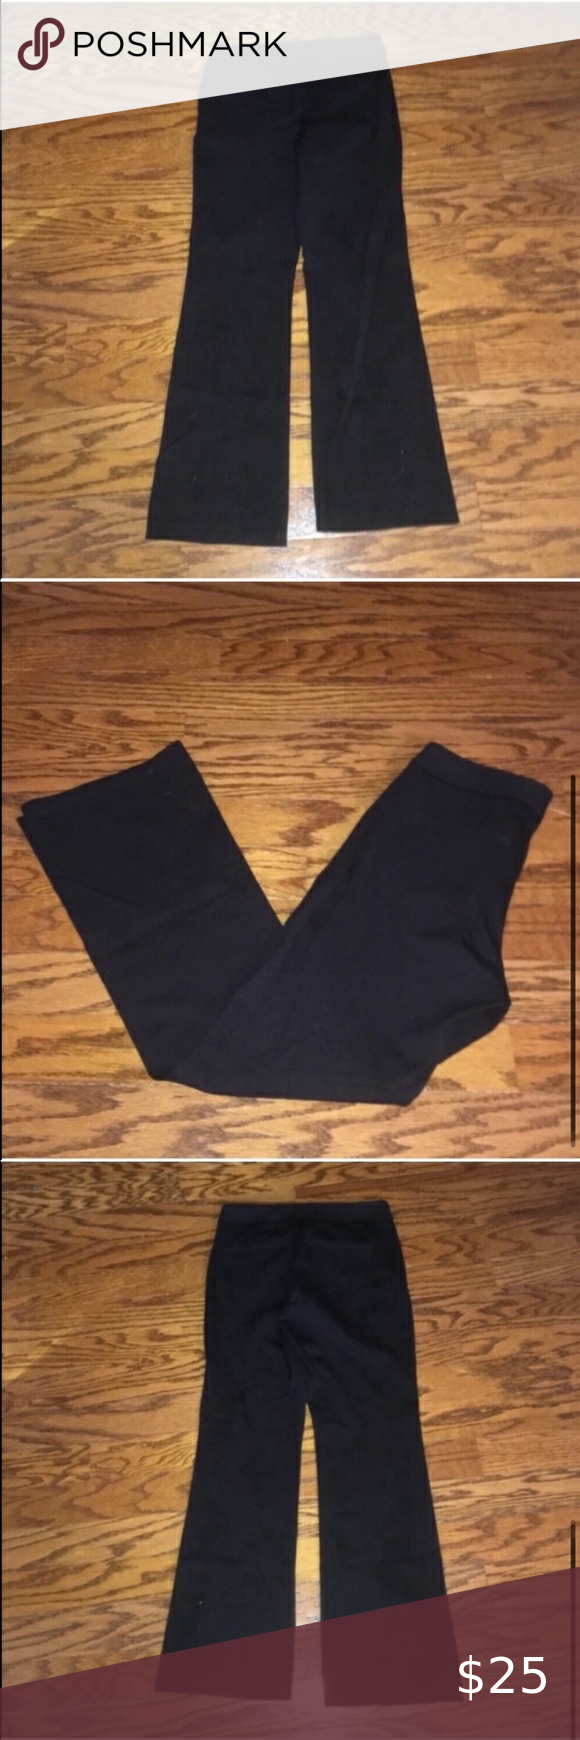 Women S Nydj Black Trouser Work Pants Not Your Daughter S Jeans Black Dress Pants Work Wear Office Wear Professional P Dress Pants Black Dress Pants Work Pants [ 1740 x 580 Pixel ]